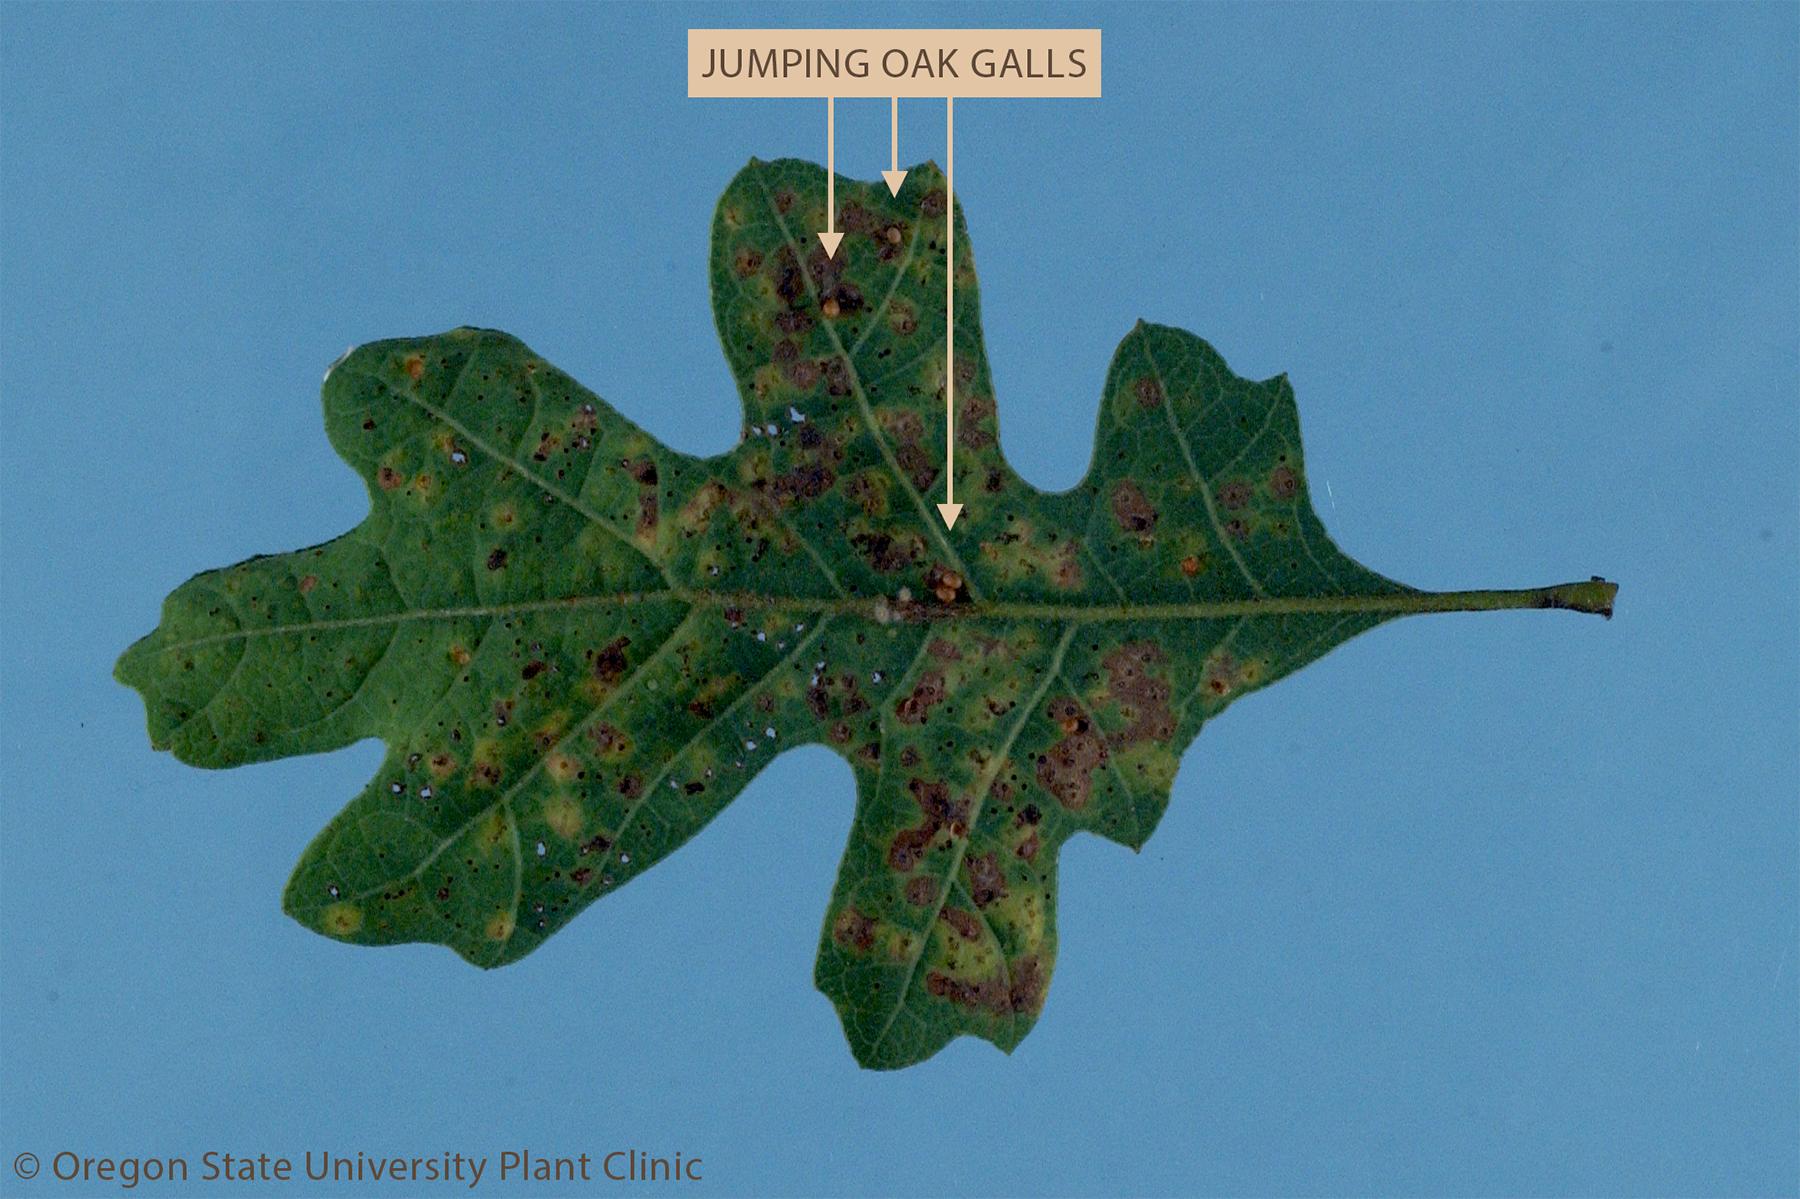 Jumping oak galls on leaf